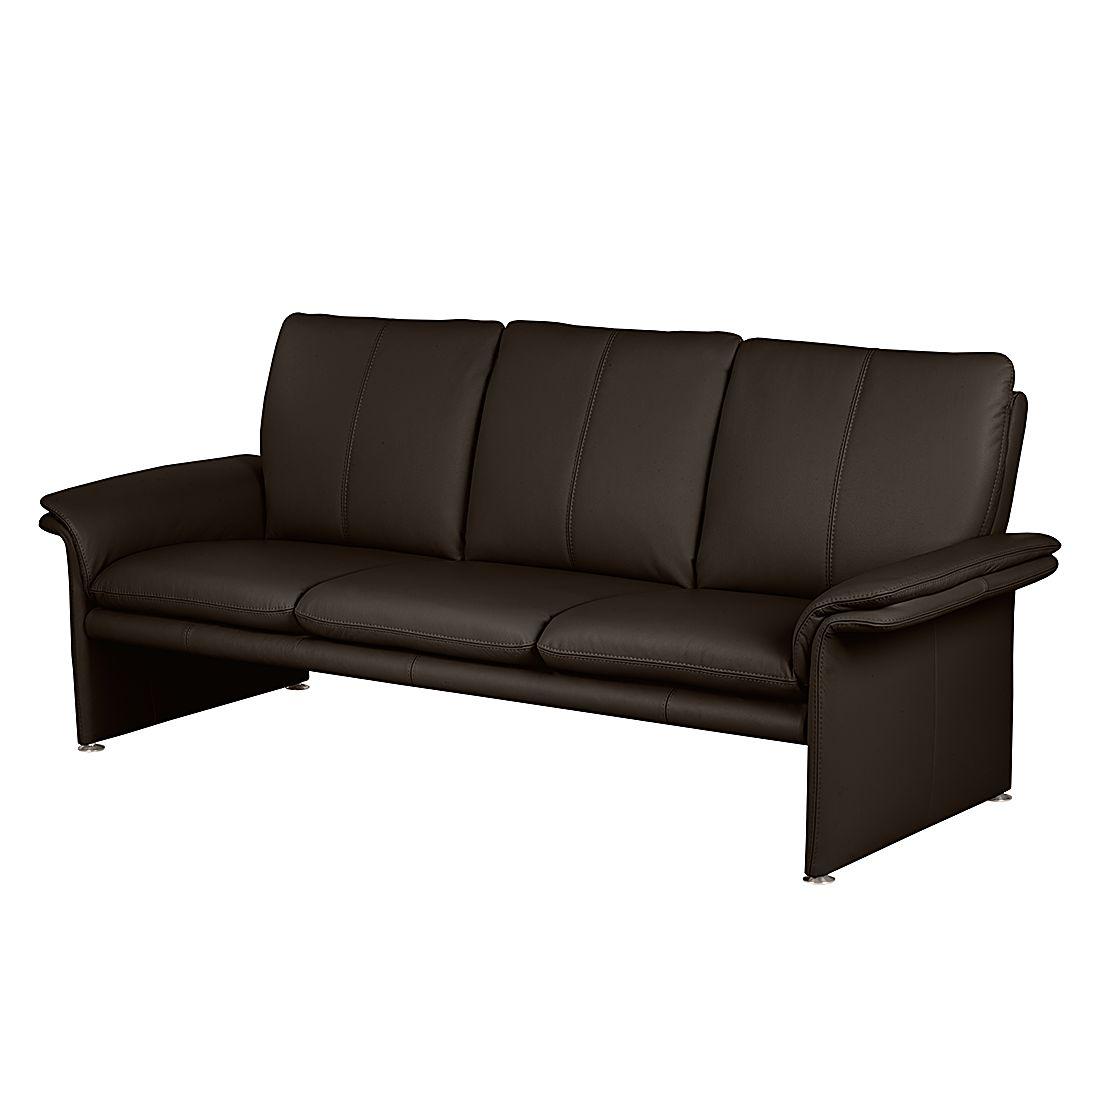 Modoform Sofa Capri 3 Sitzer Dunkelbraun Echtleder 214x90x88 Cm Bxhxt Modern In 2020 Sofa Mit Relaxfunktion Sofa Sofas